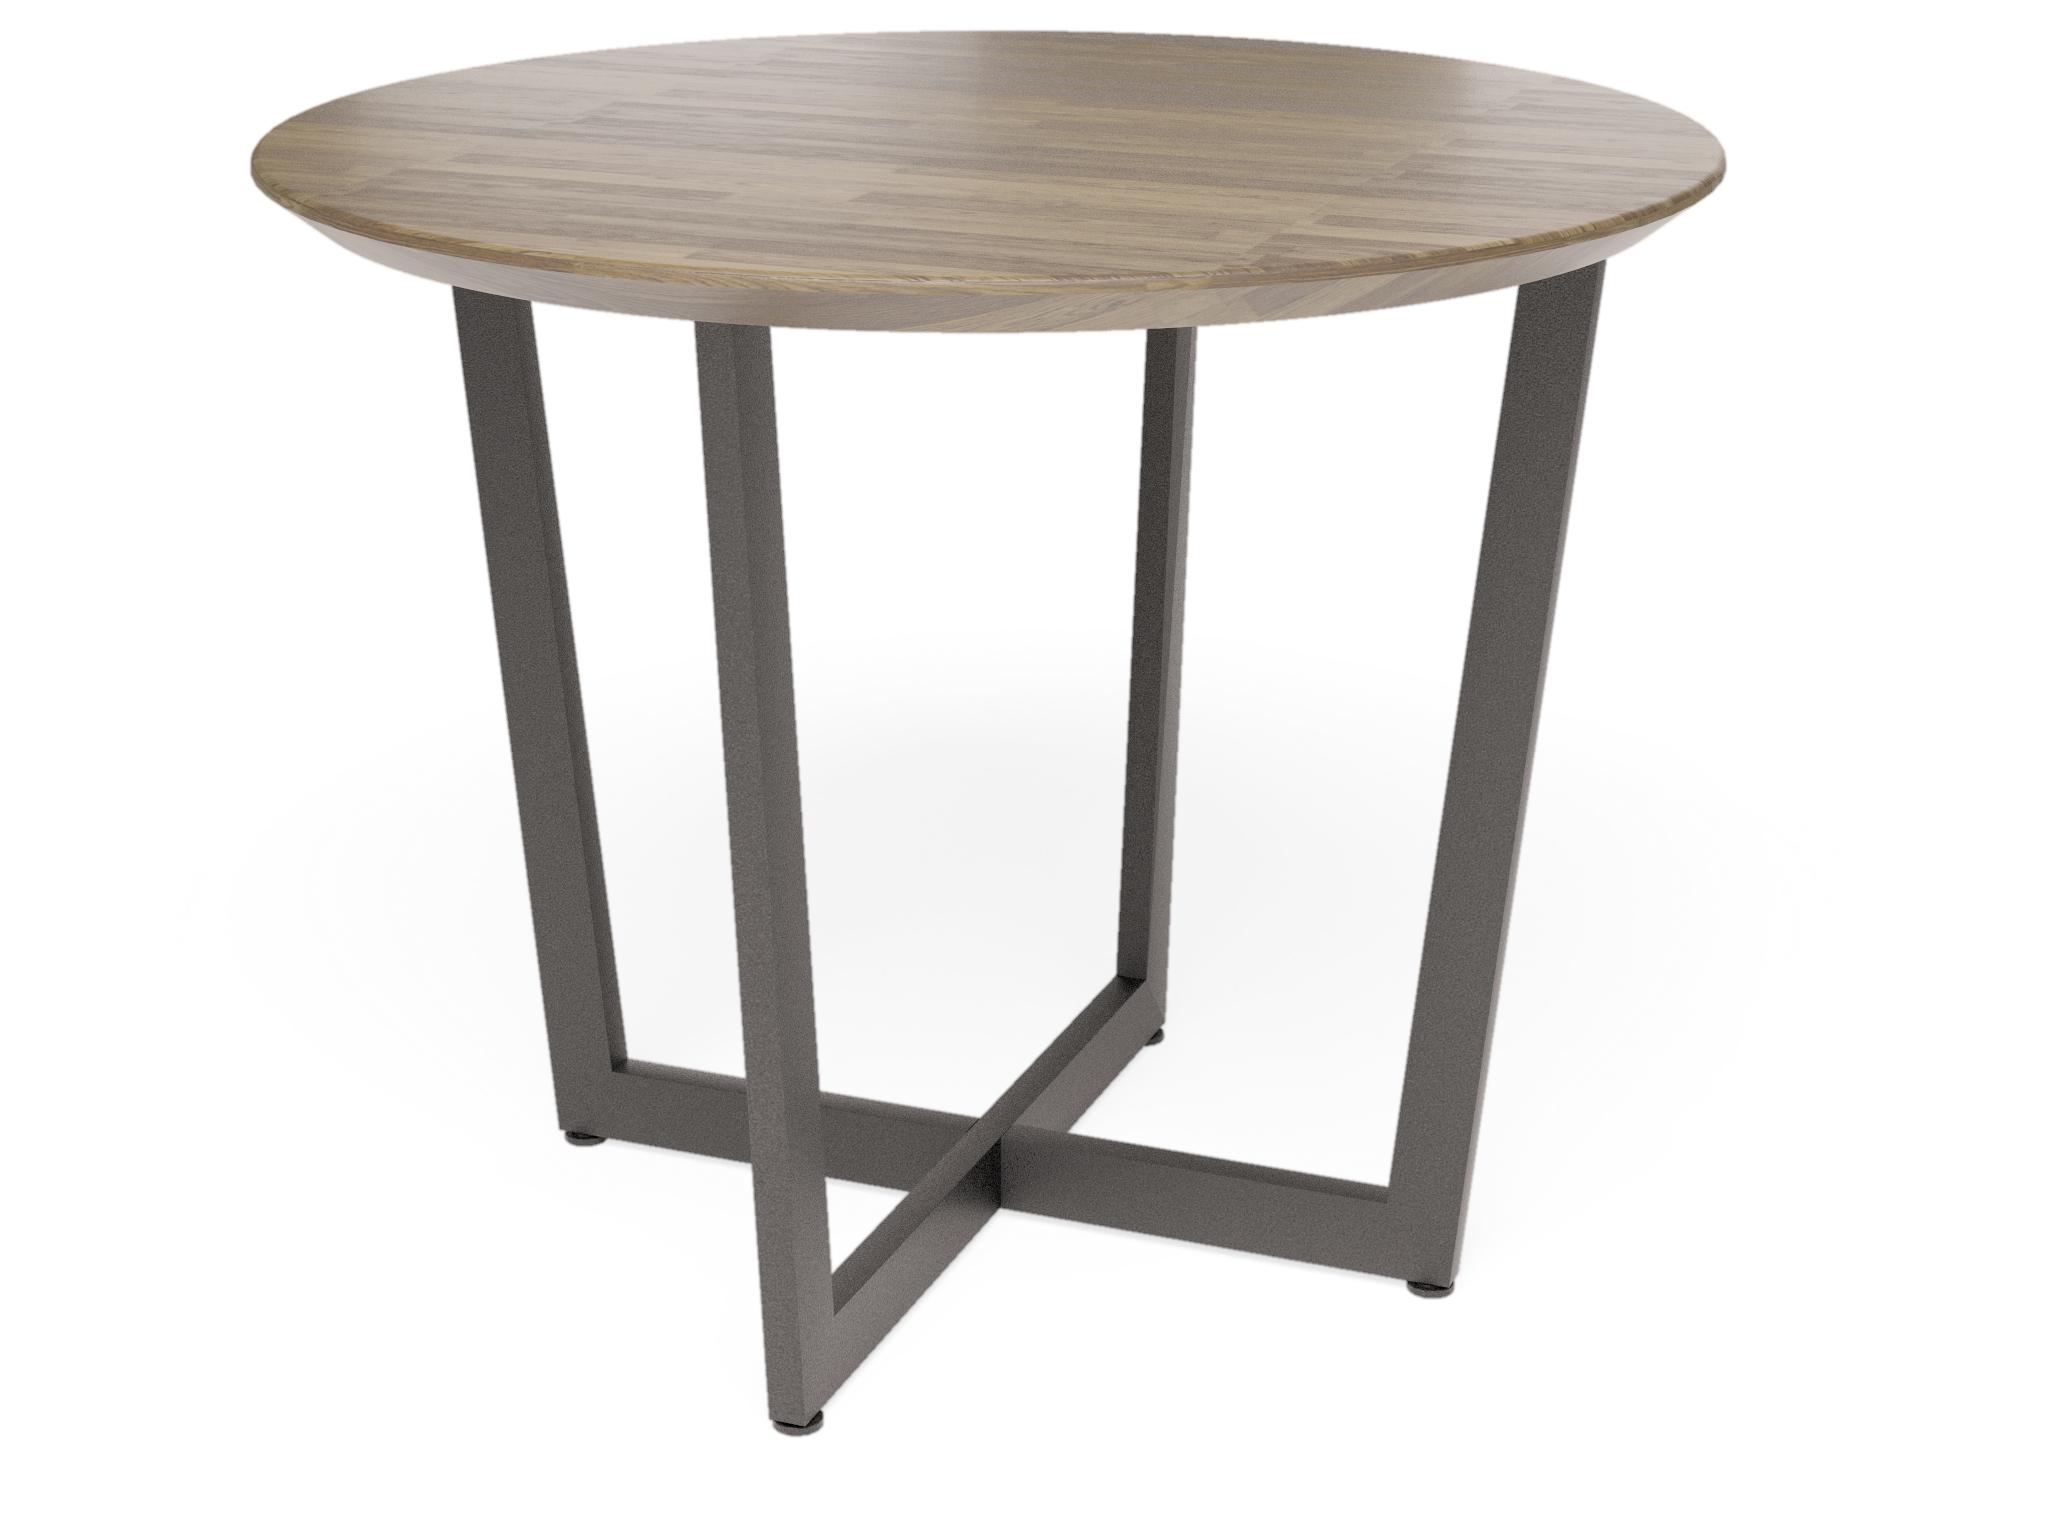 Кухонный стол Millwood 15436801 от thefurnish